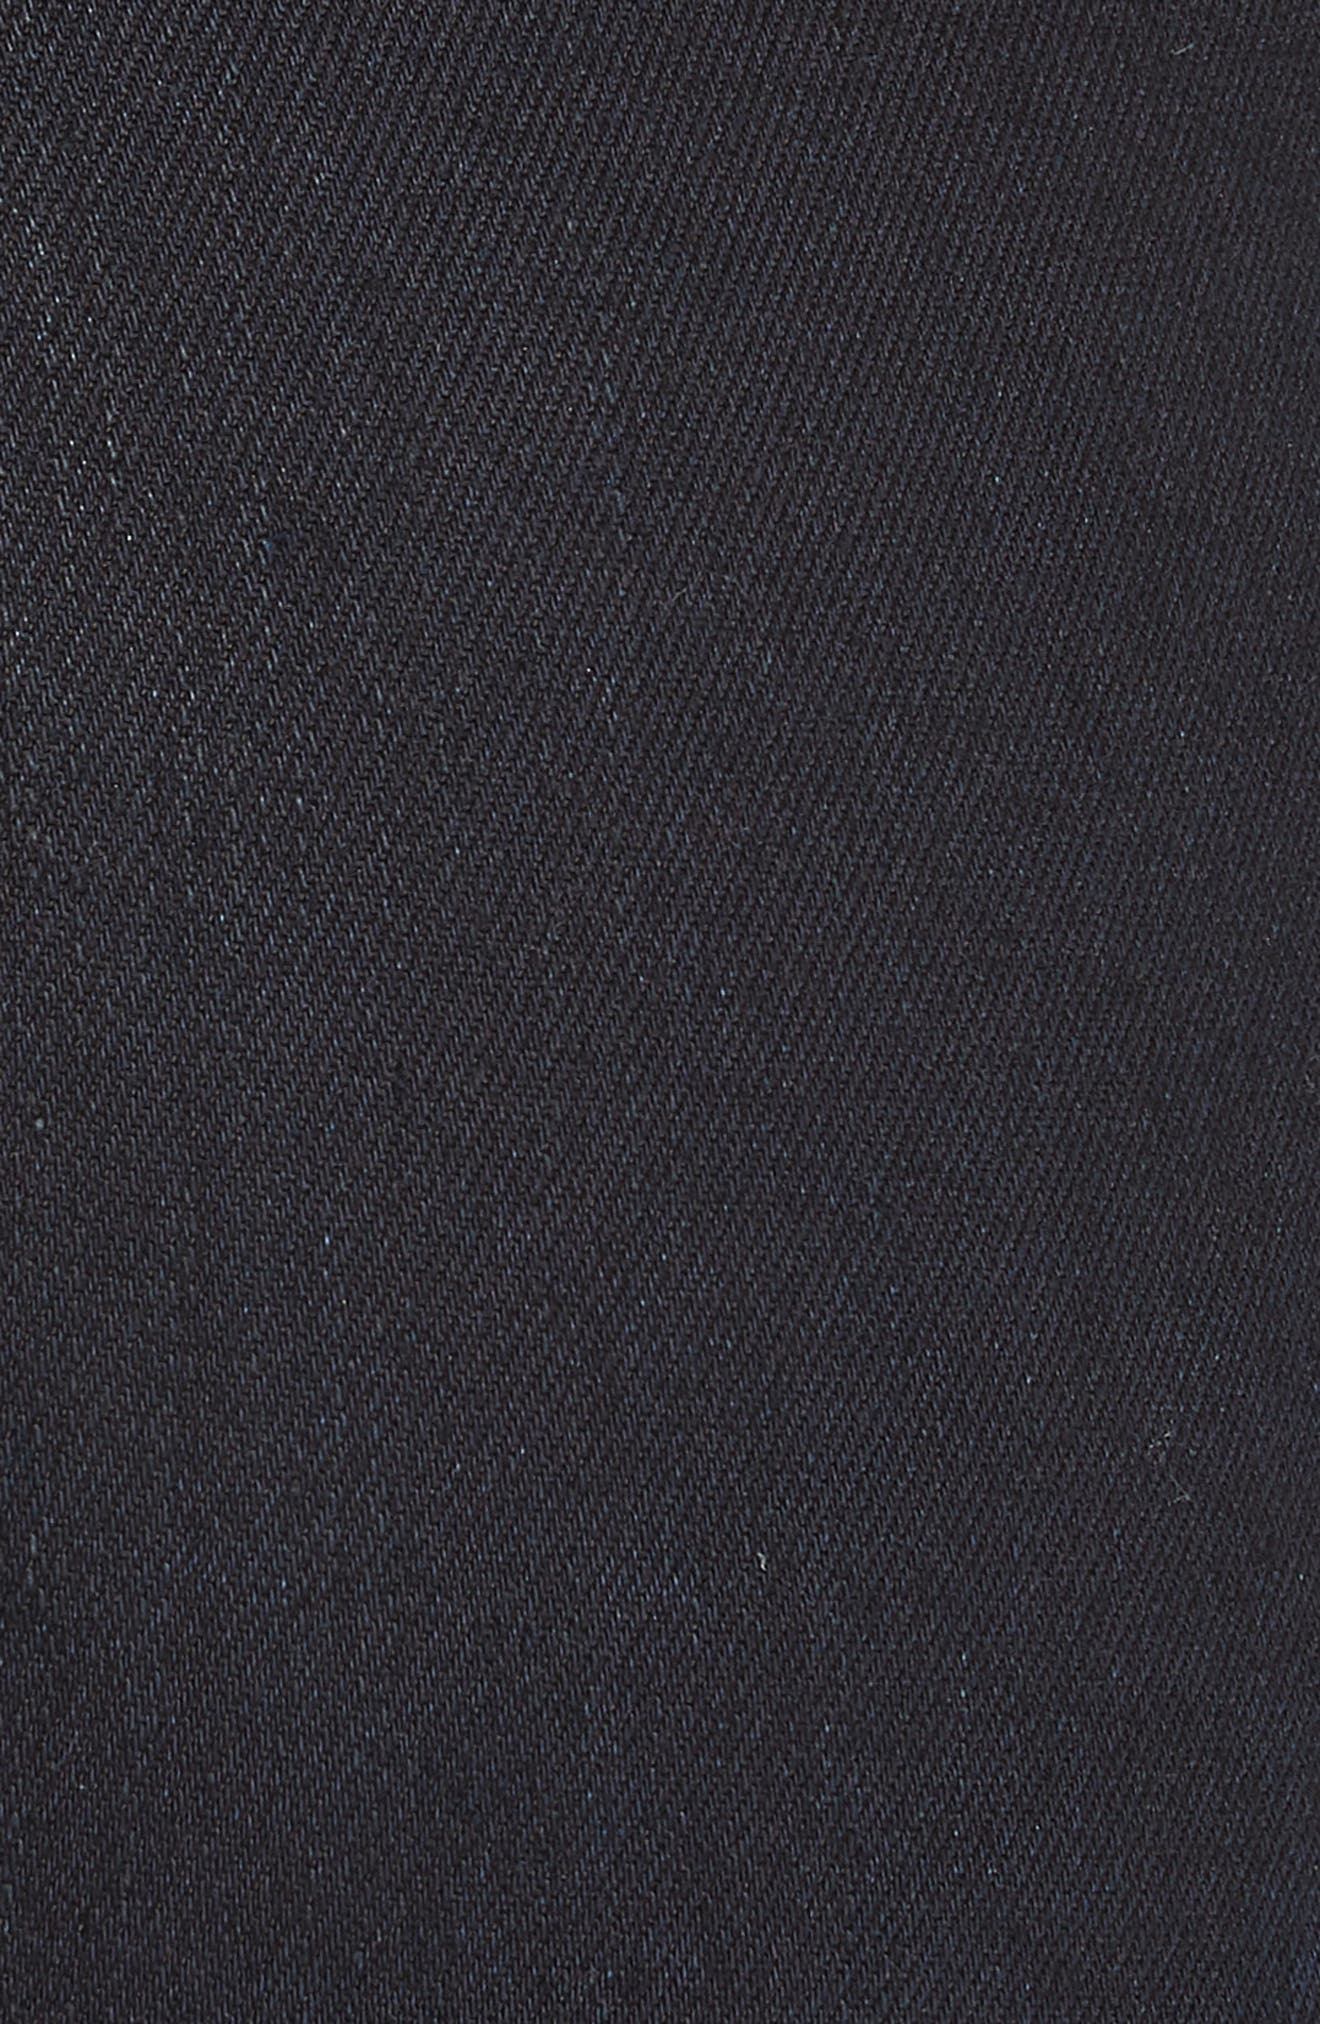 Dalida Button Detail Skinny Flare Jeans,                             Alternate thumbnail 5, color,                             INDIGO